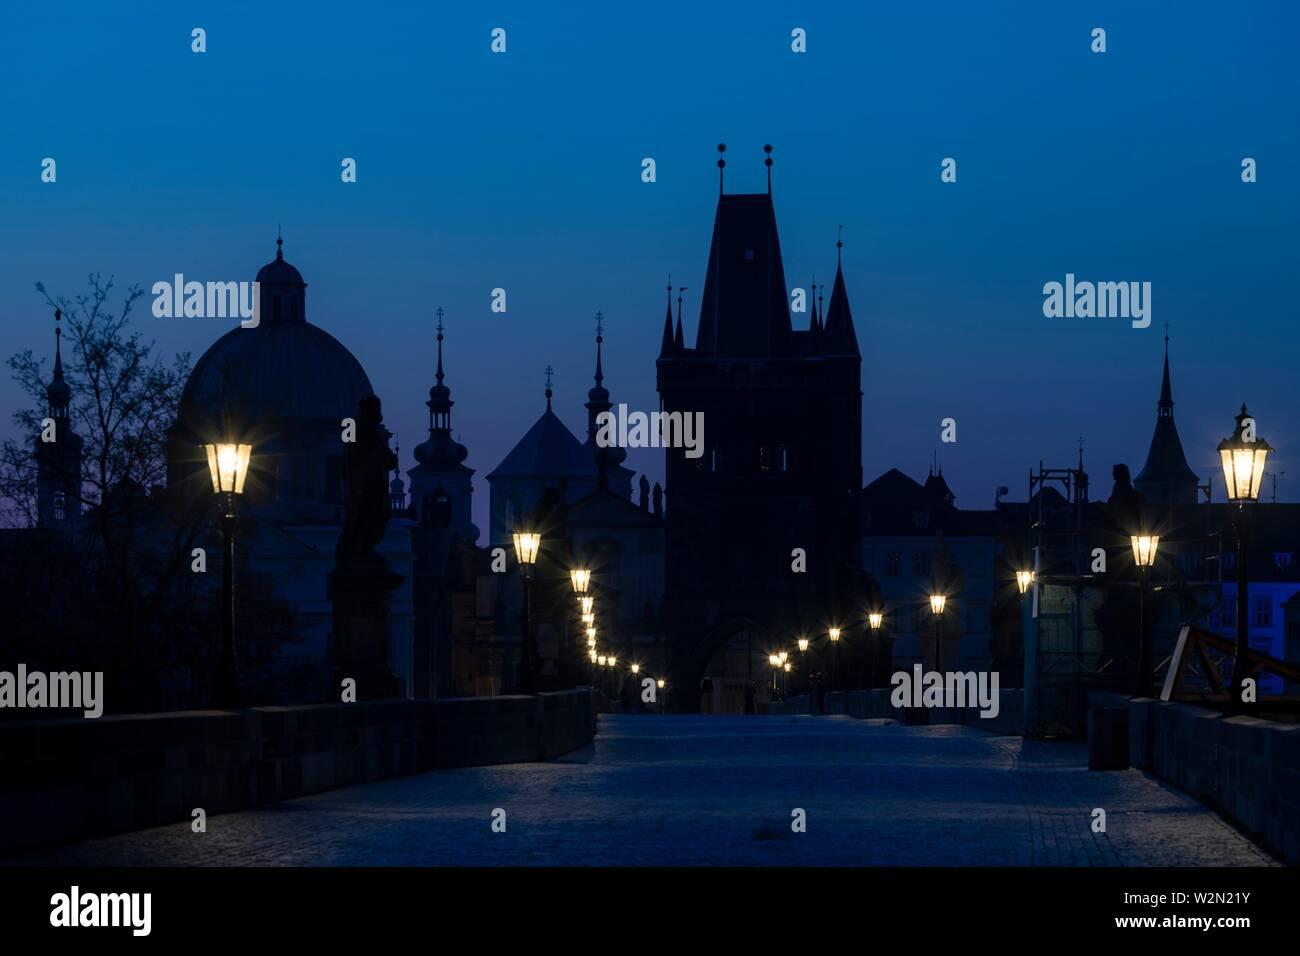 Charles bridge at Sunrise, Prague, Czech Republic. - Stock Image